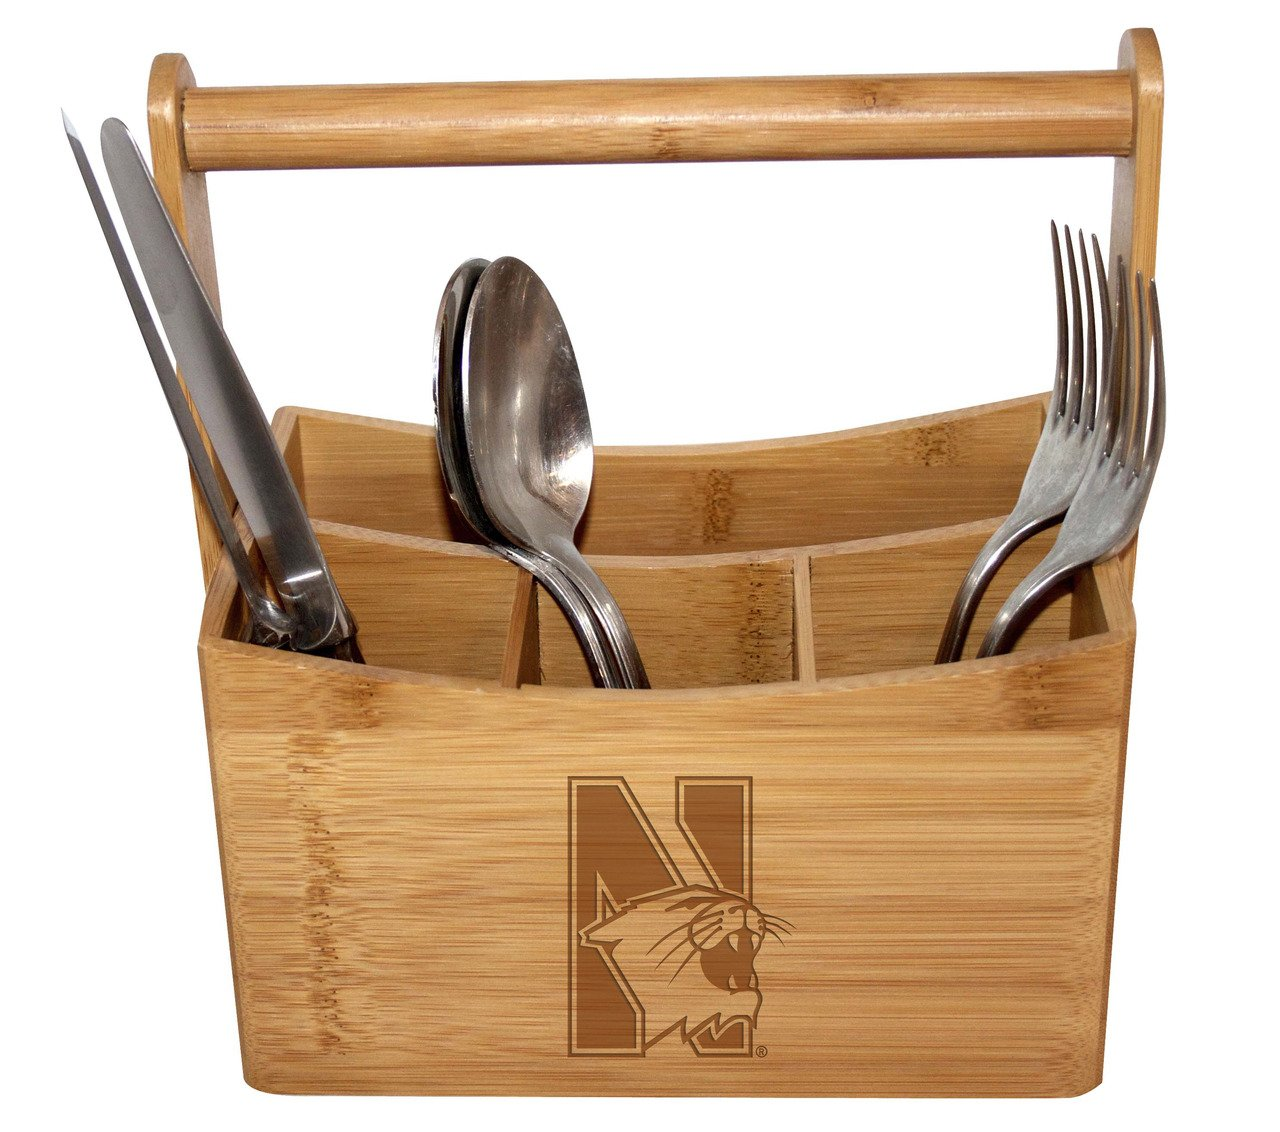 Northwestern Bamboo Caddy